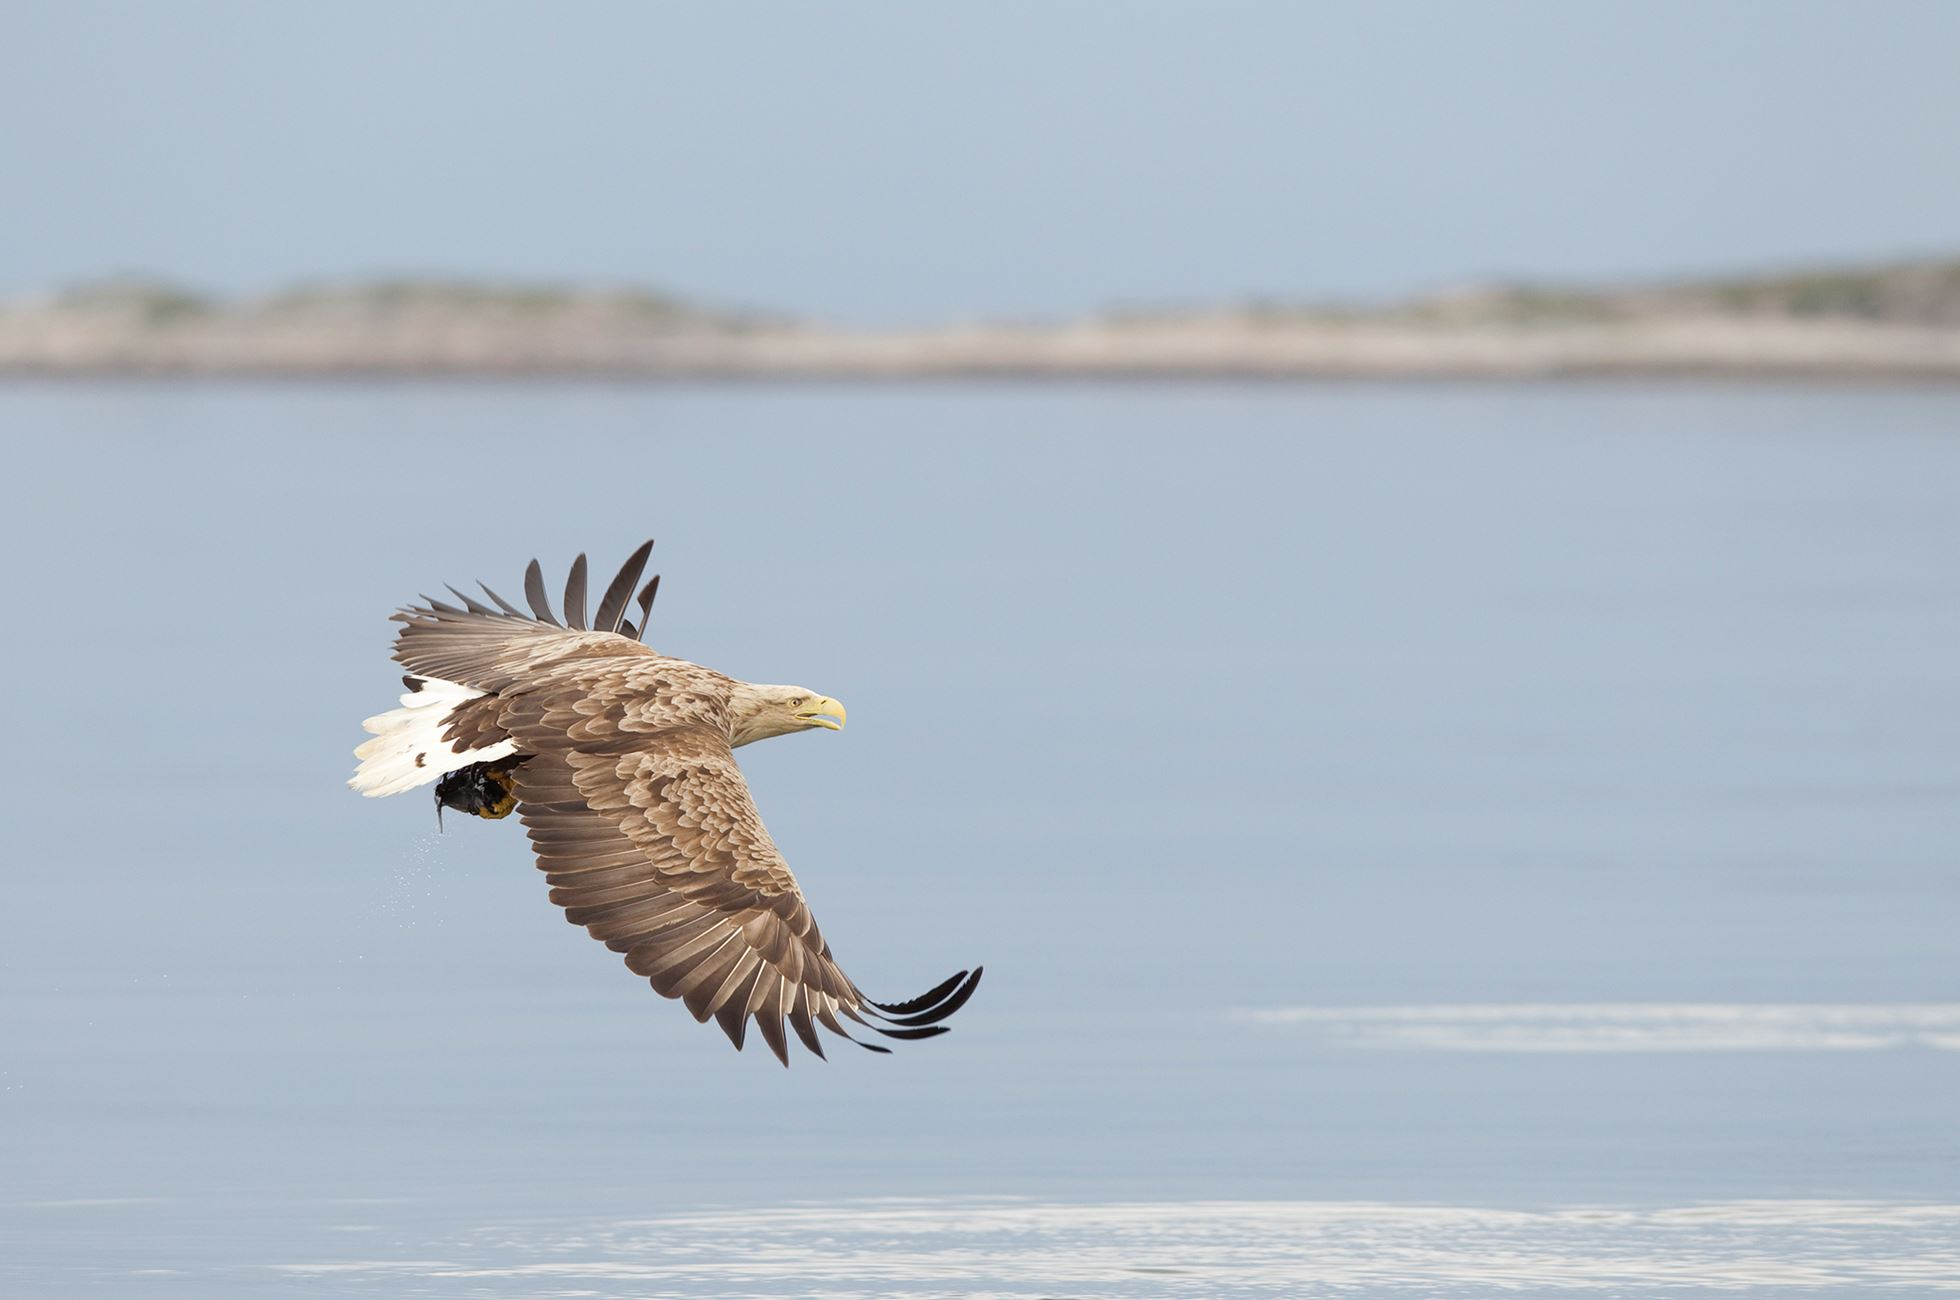 White-tailed eagle(Haliaeetus albiciila) flying along coast, Flatanger, Norway